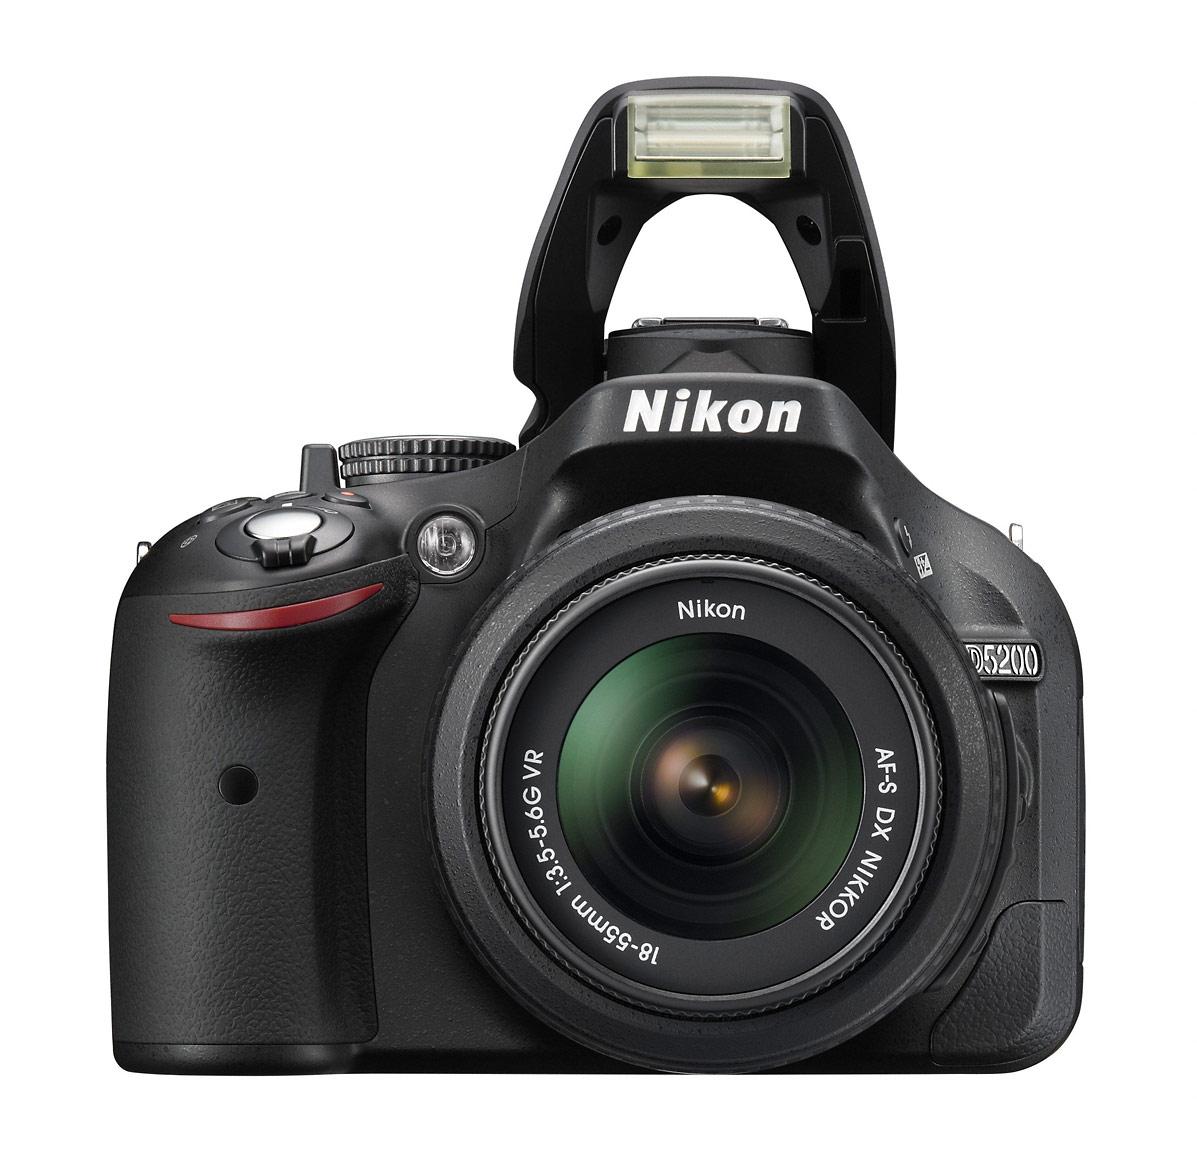 Nikon D5200 Digital SLR - Pop-Up Flash